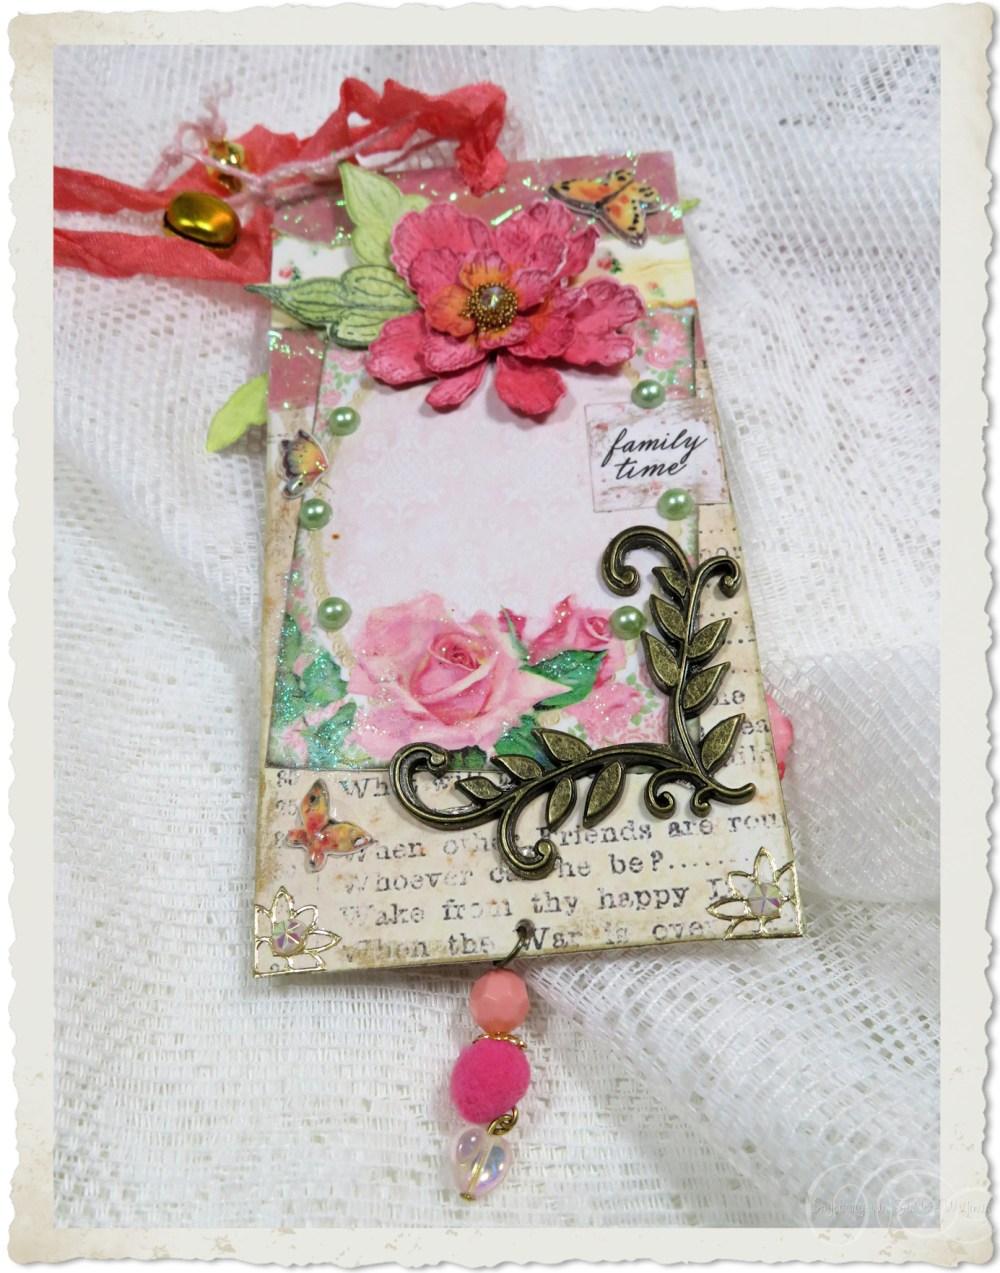 Backside of handmade paper tag